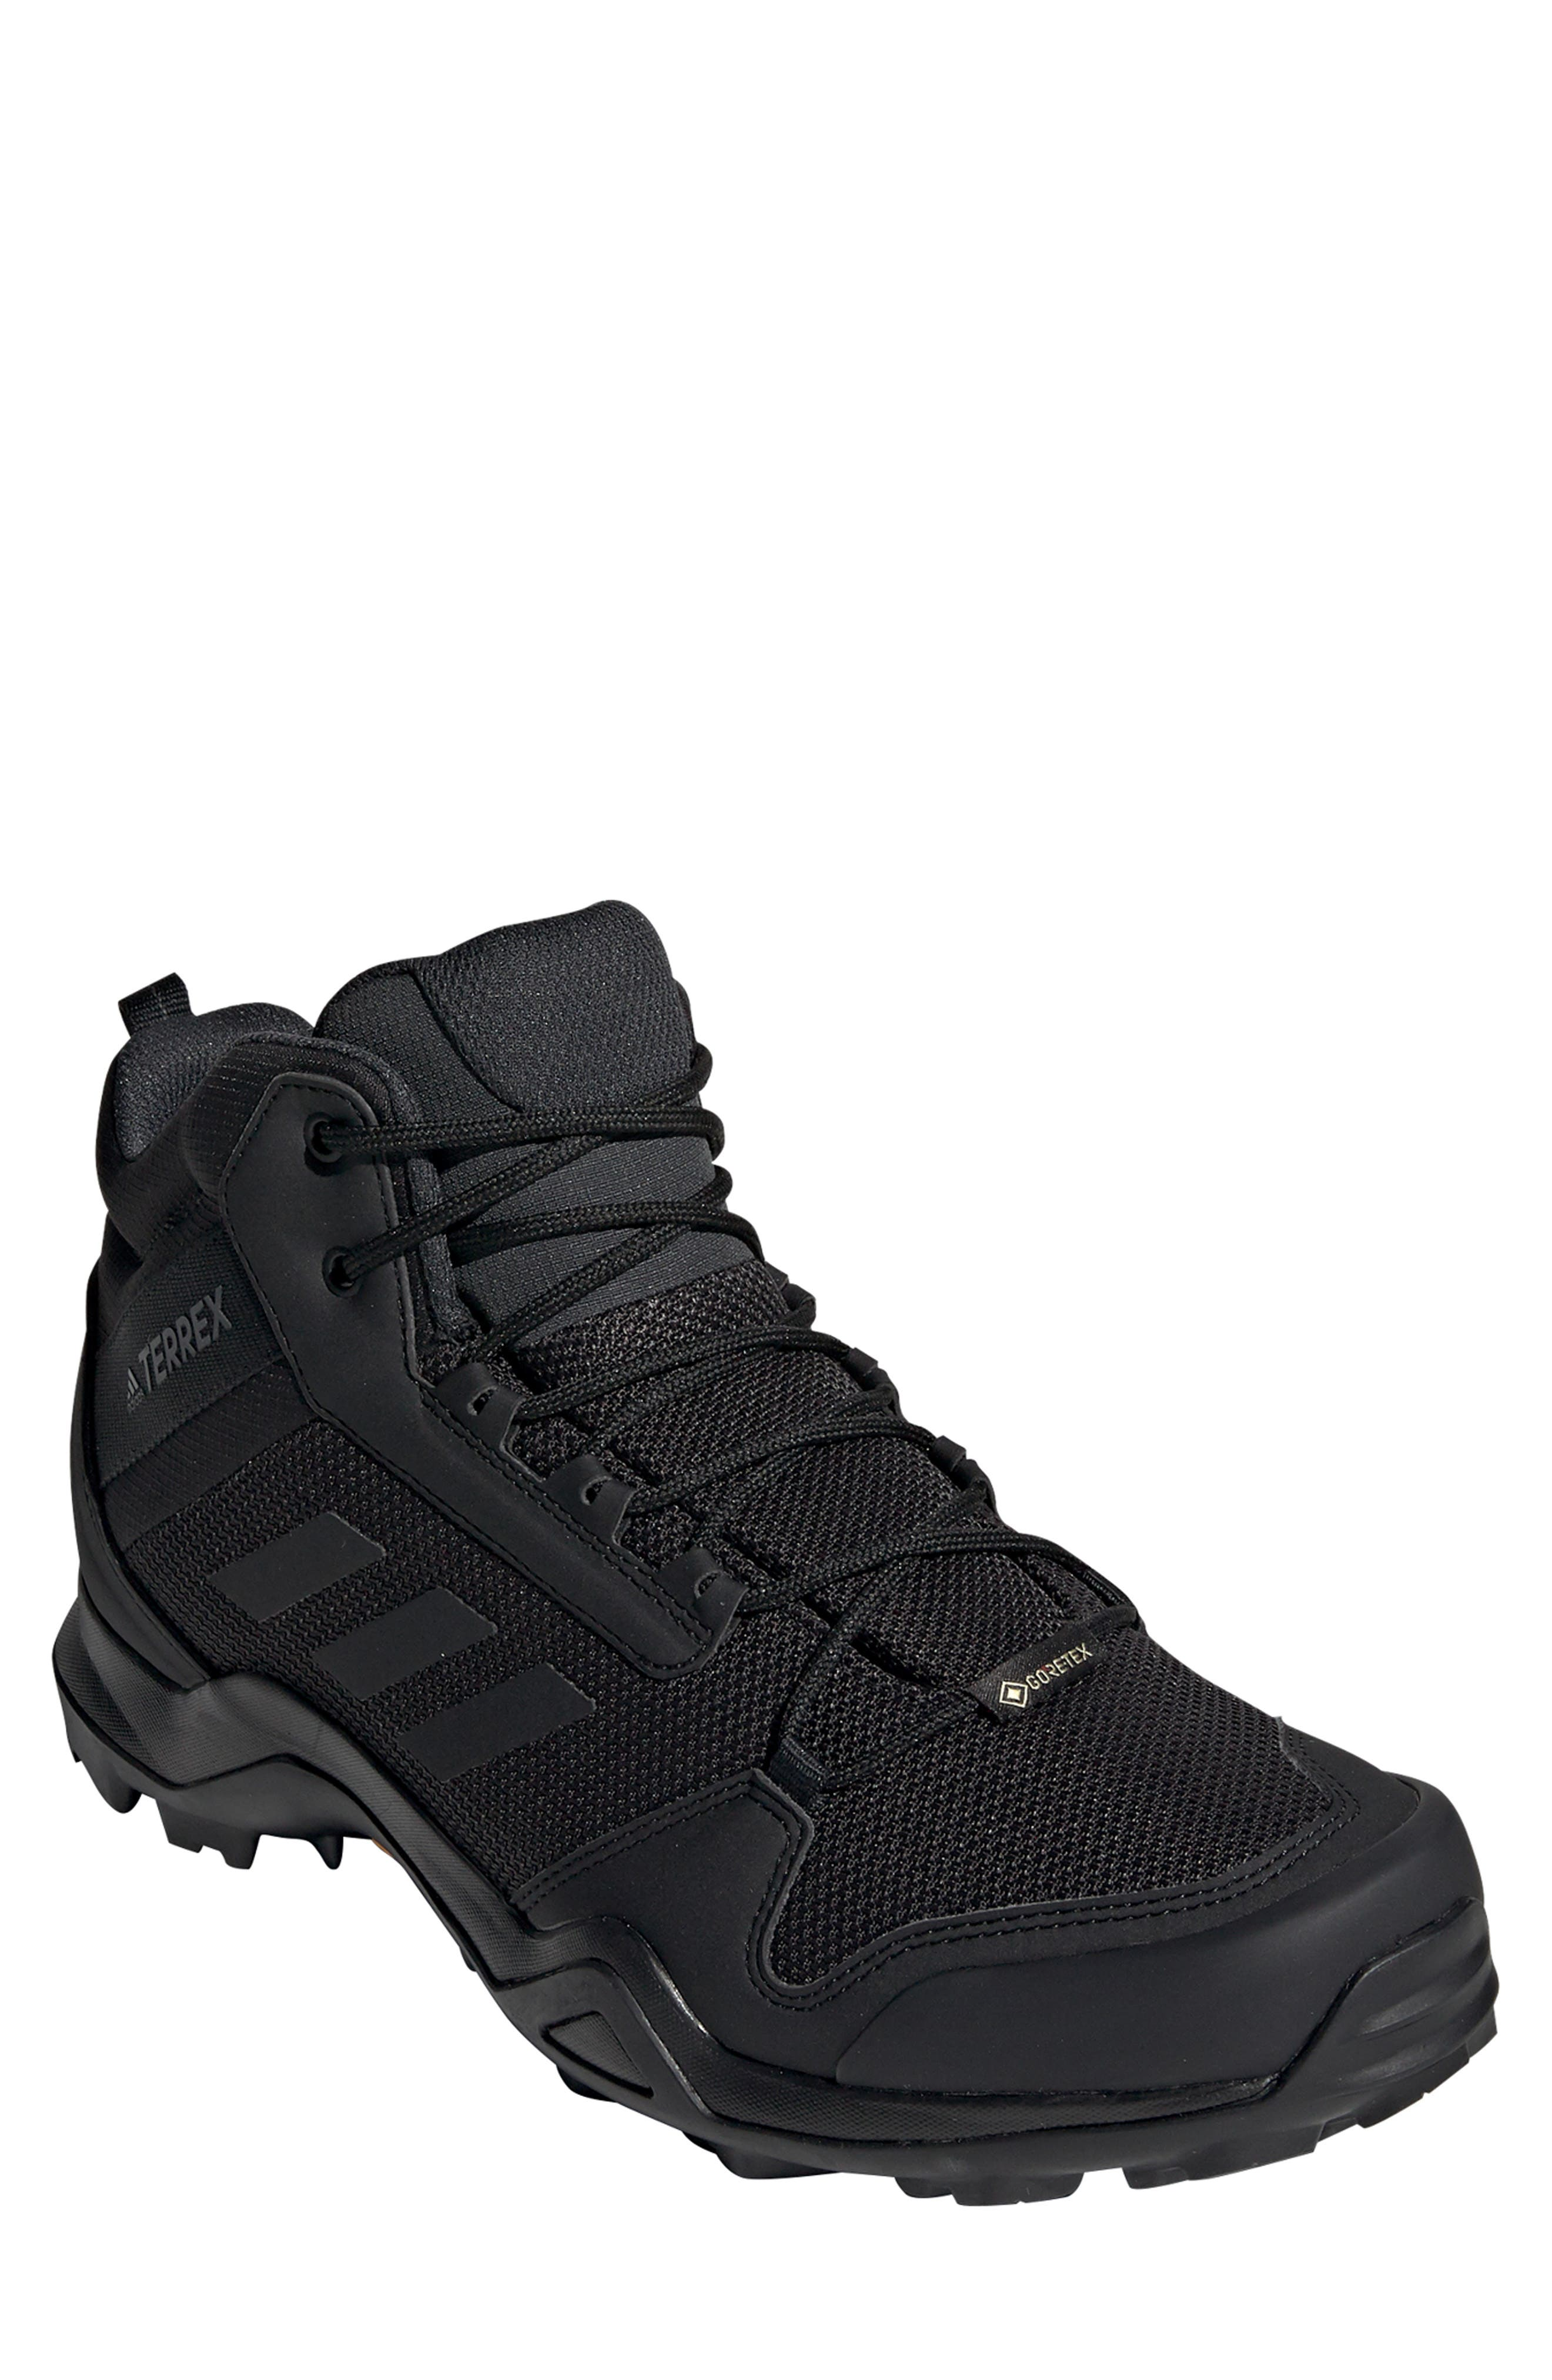 adidas originals black high tops, Adidas Originals nmd xr1